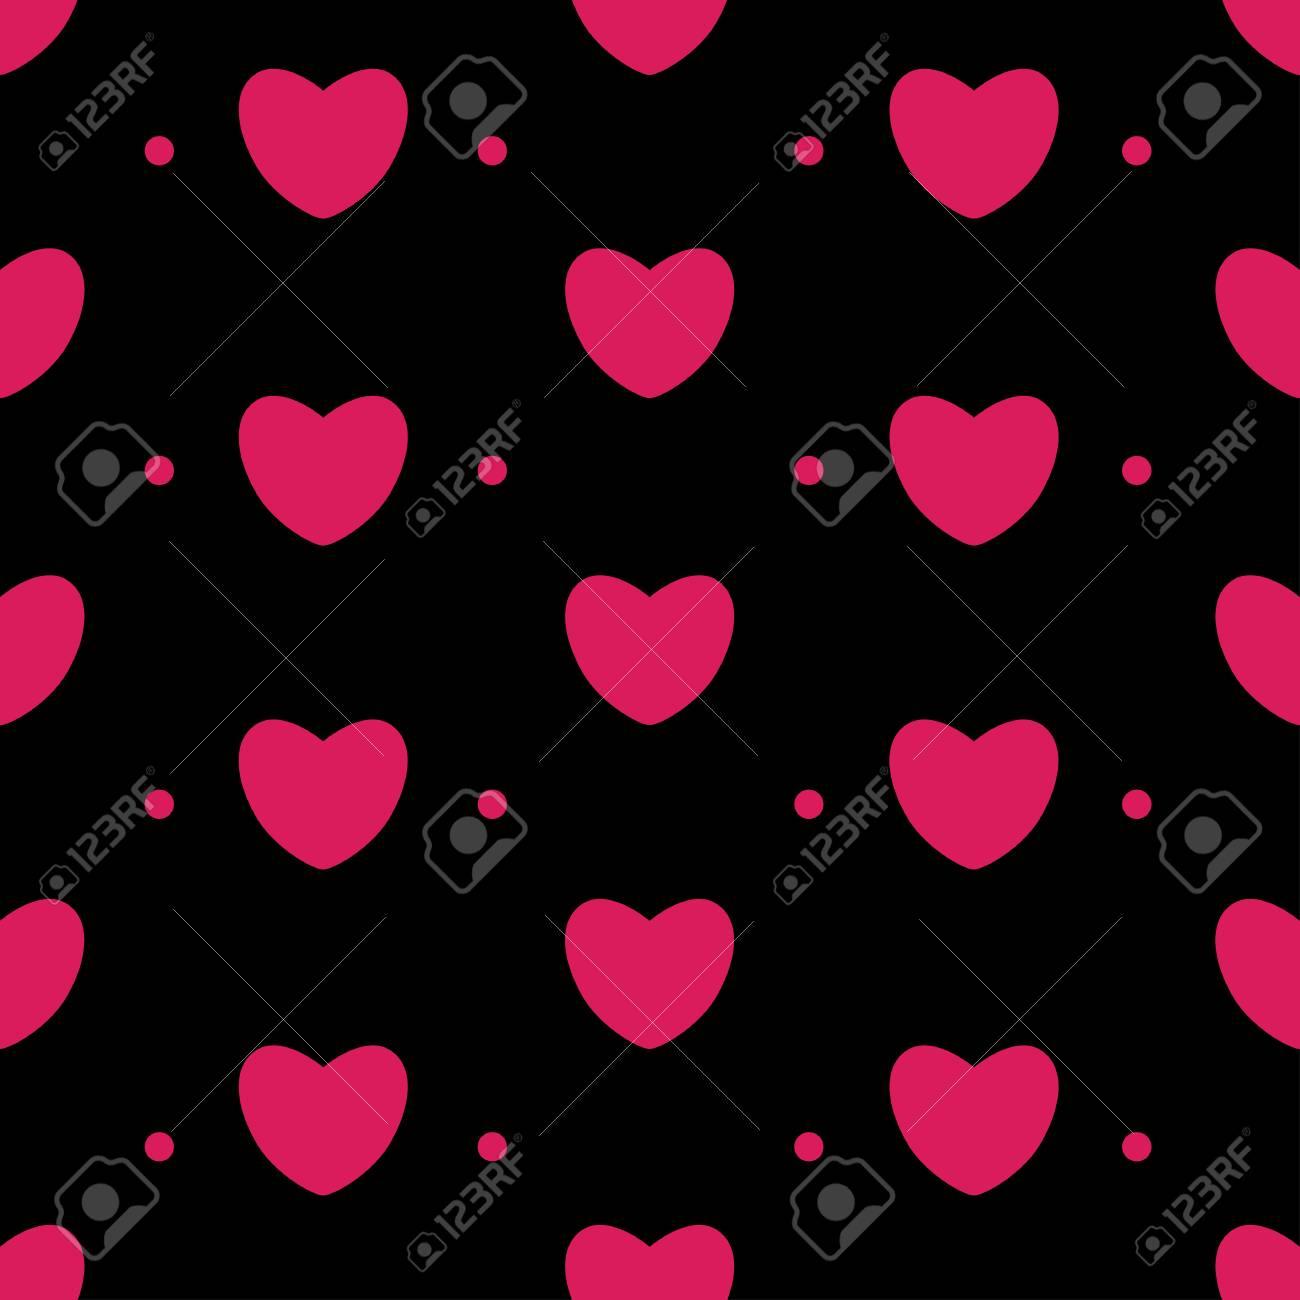 Imagenes de corazones fondo negro